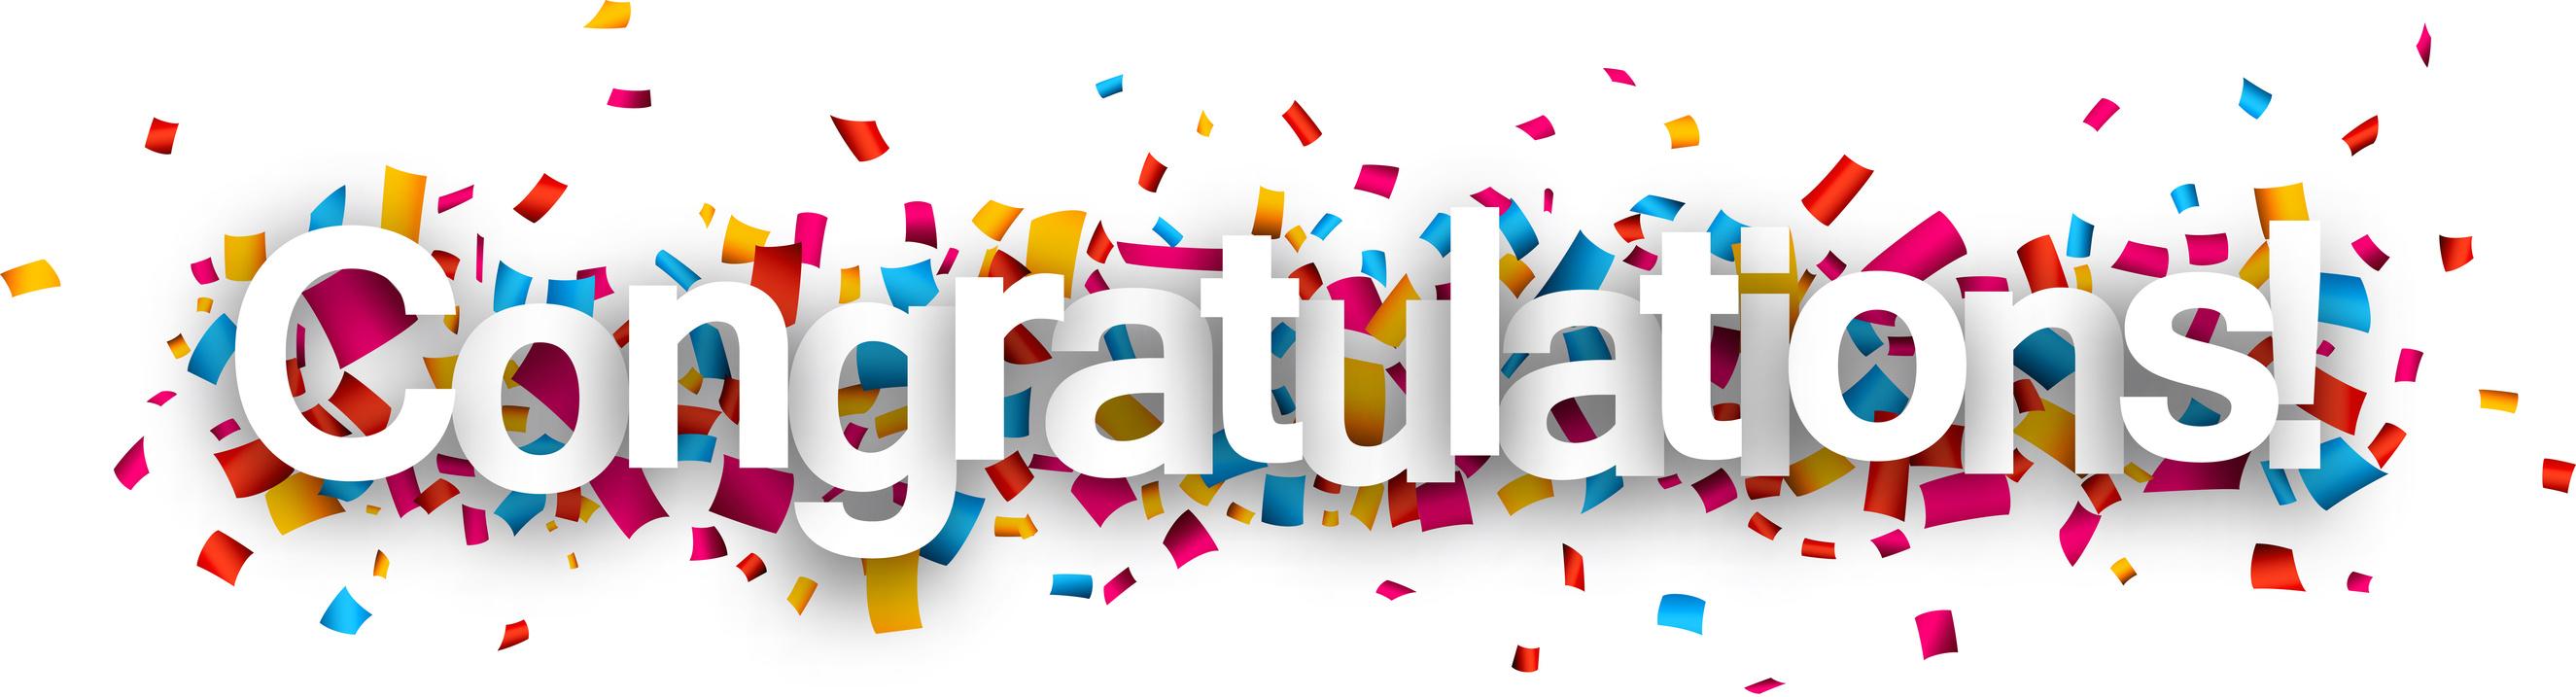 Nyaeyc congratulations paper sign. Confetti clipart congratulation